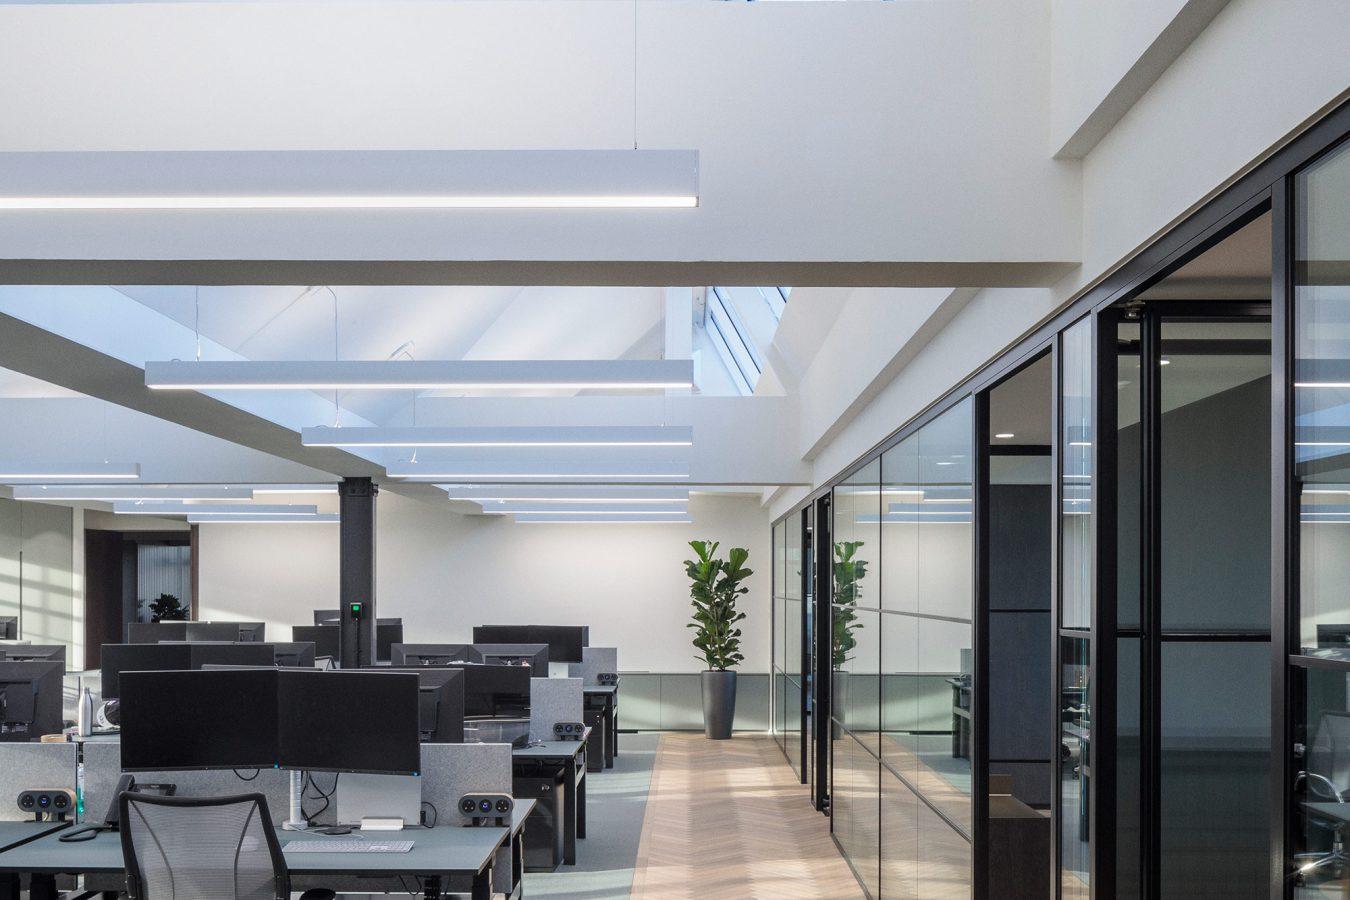 Herringbone parquet flooring in an open-plan workspace.